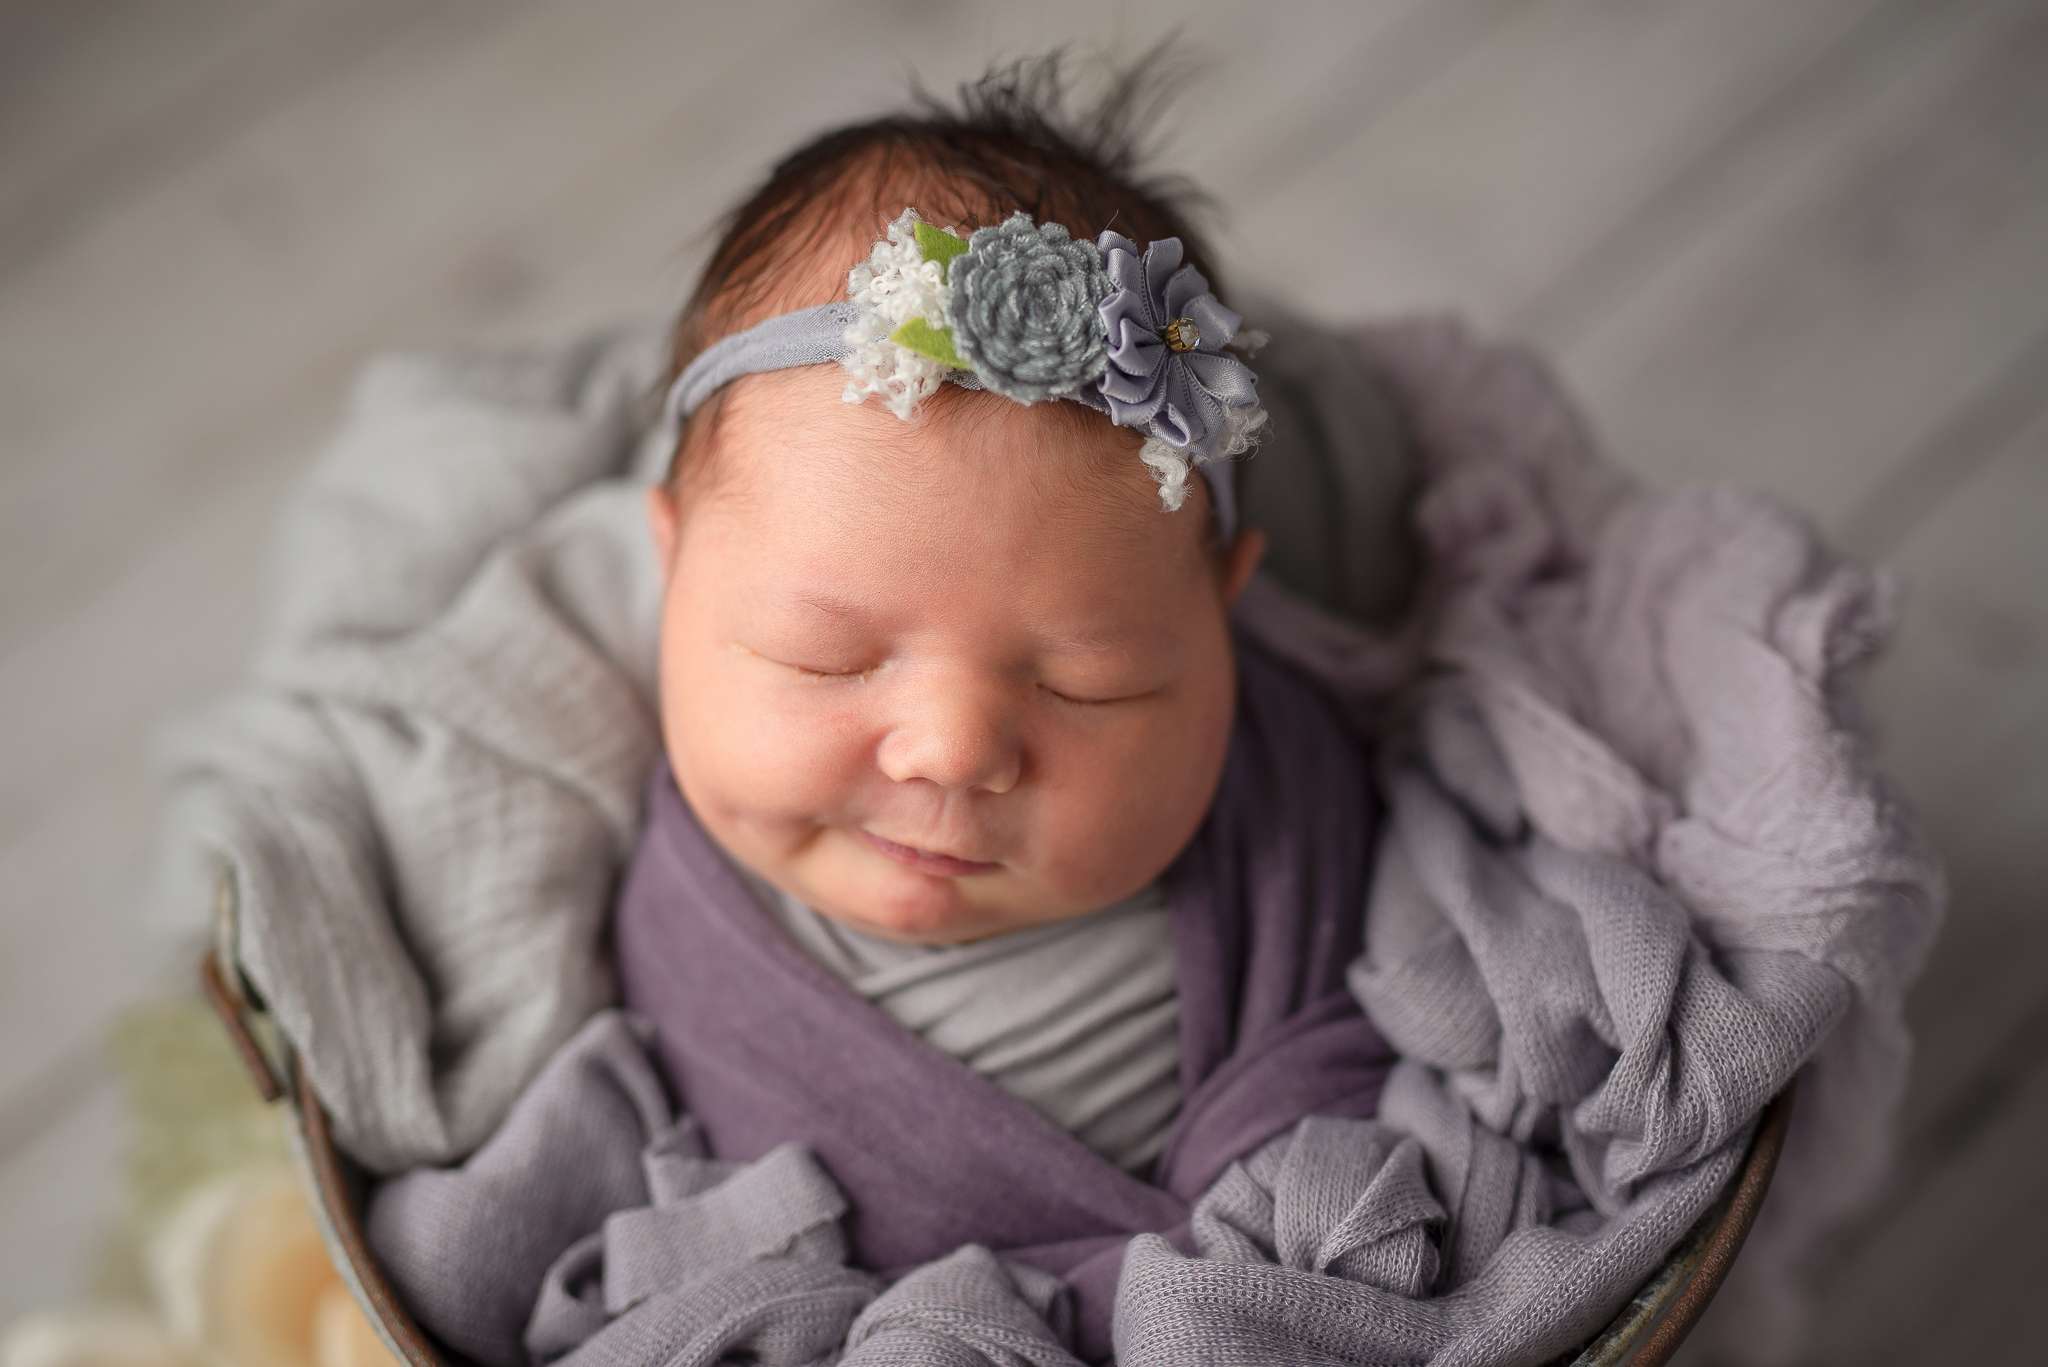 Newborn183NaomiLuciennePhotography102018-2-Edit.jpg